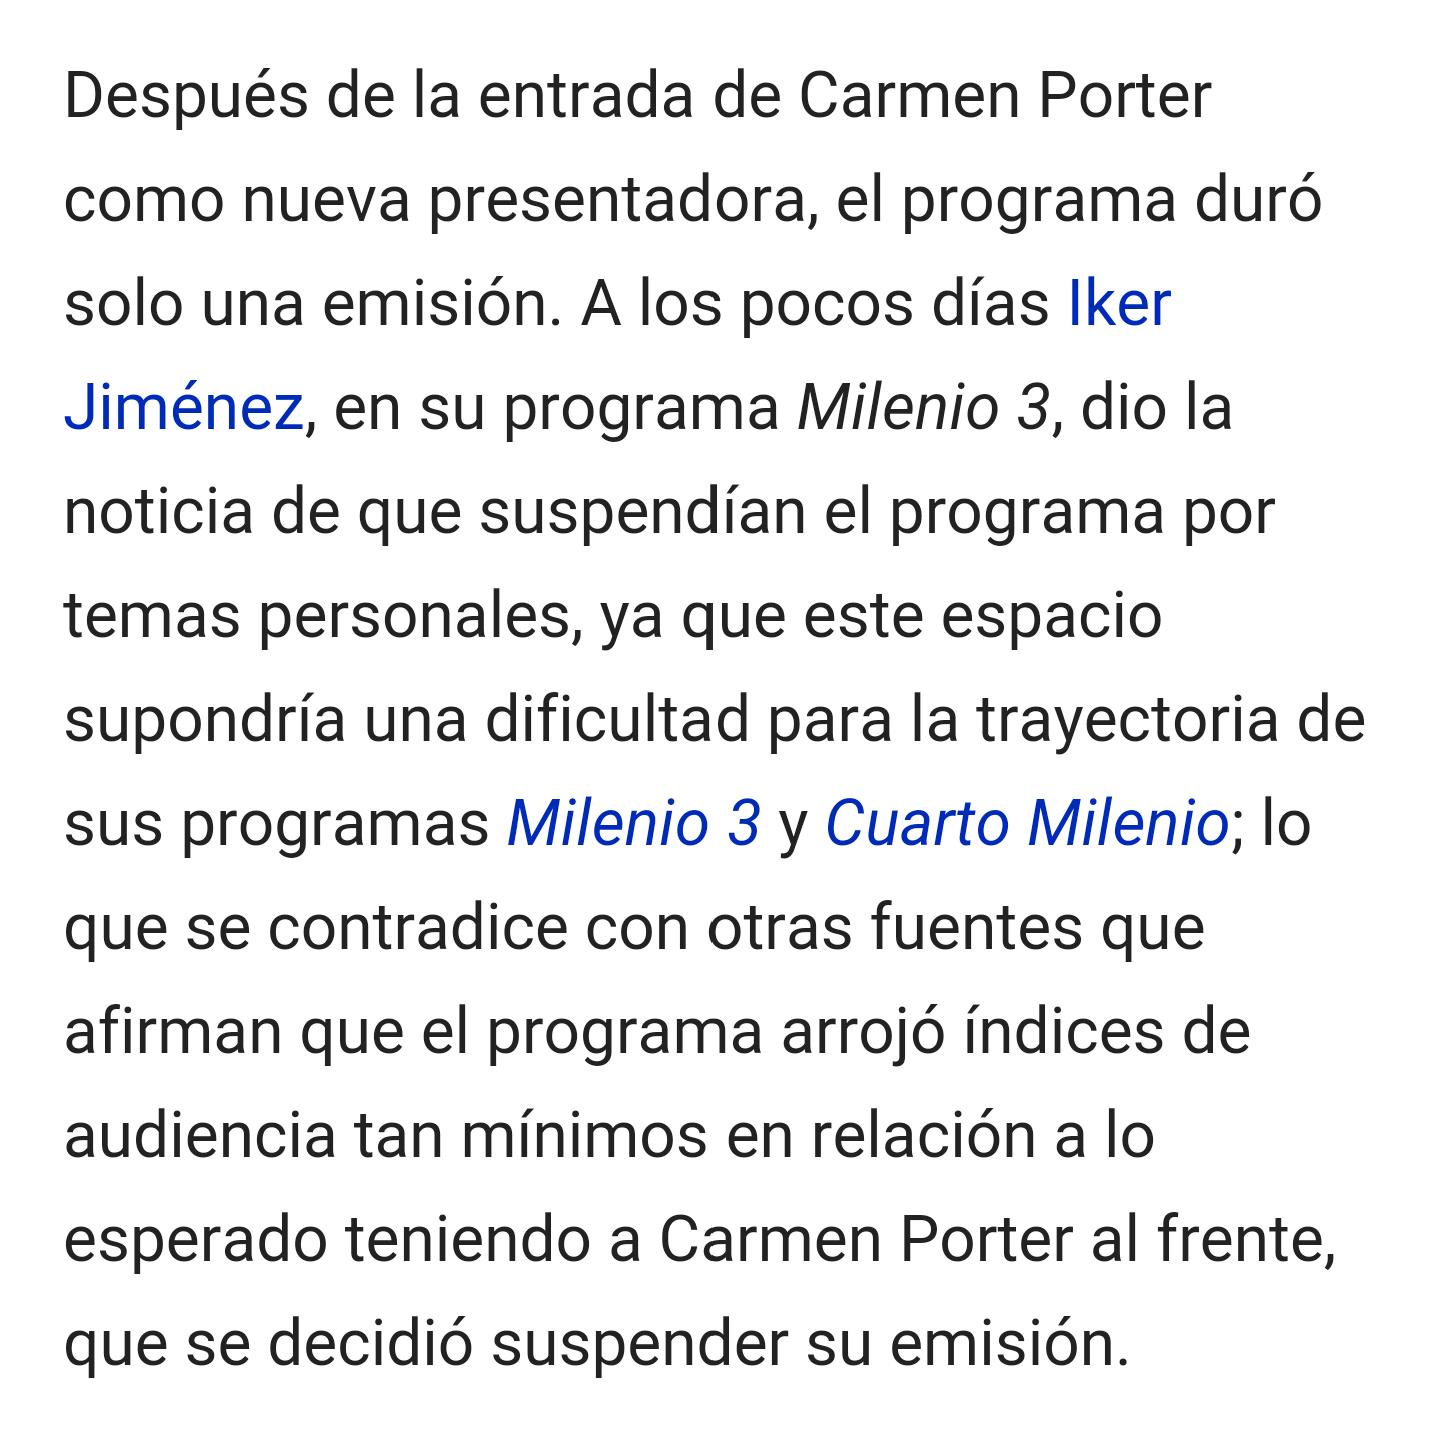 Debate Carmen porter sobra en cuarto milenio - Página 2